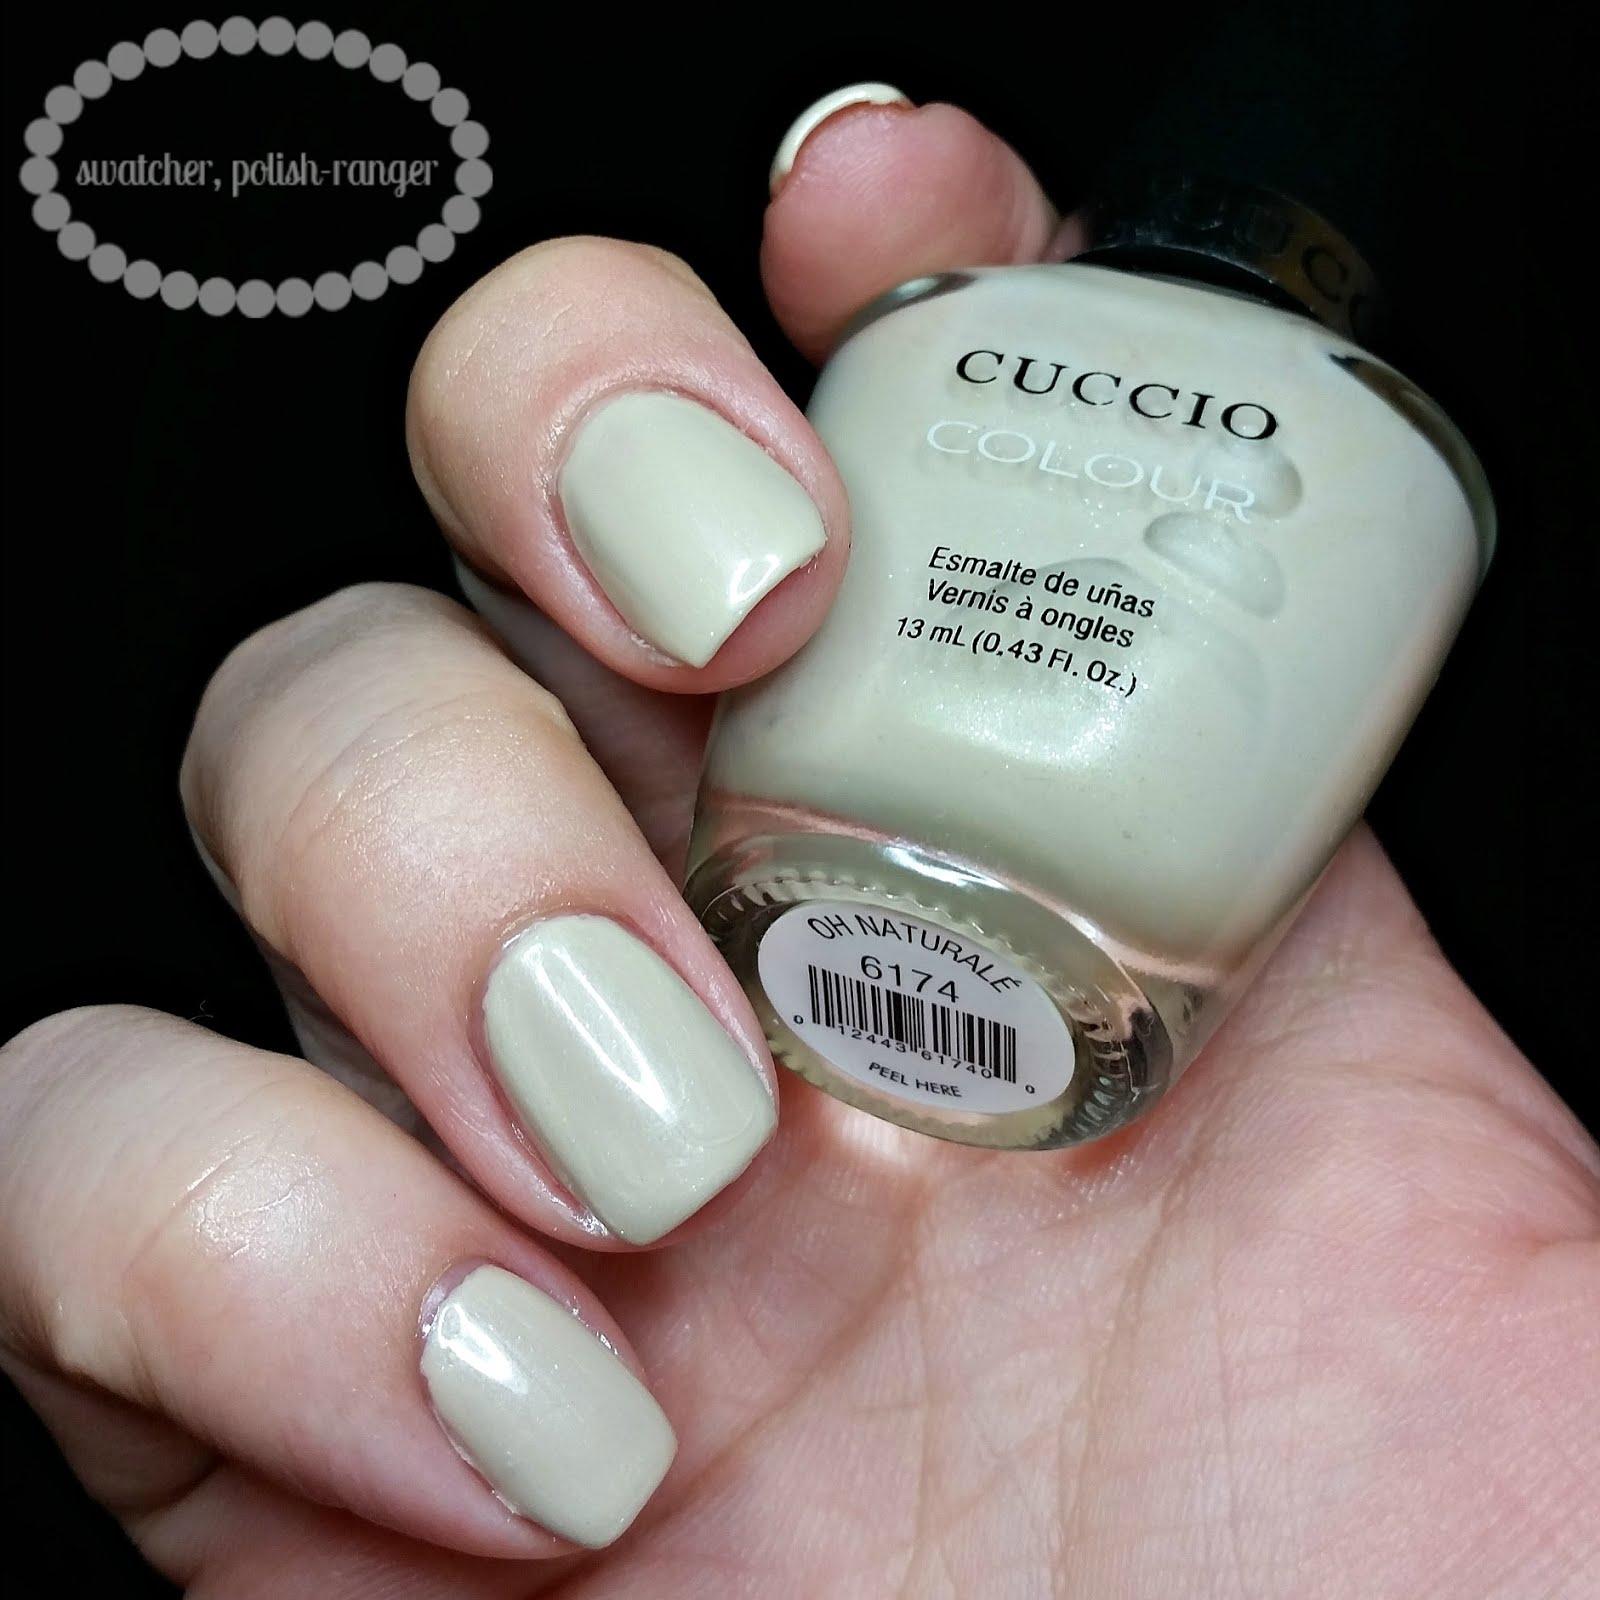 swatcher, polish-ranger: Cuccio Colour Nudetrals Collection *Picture ...